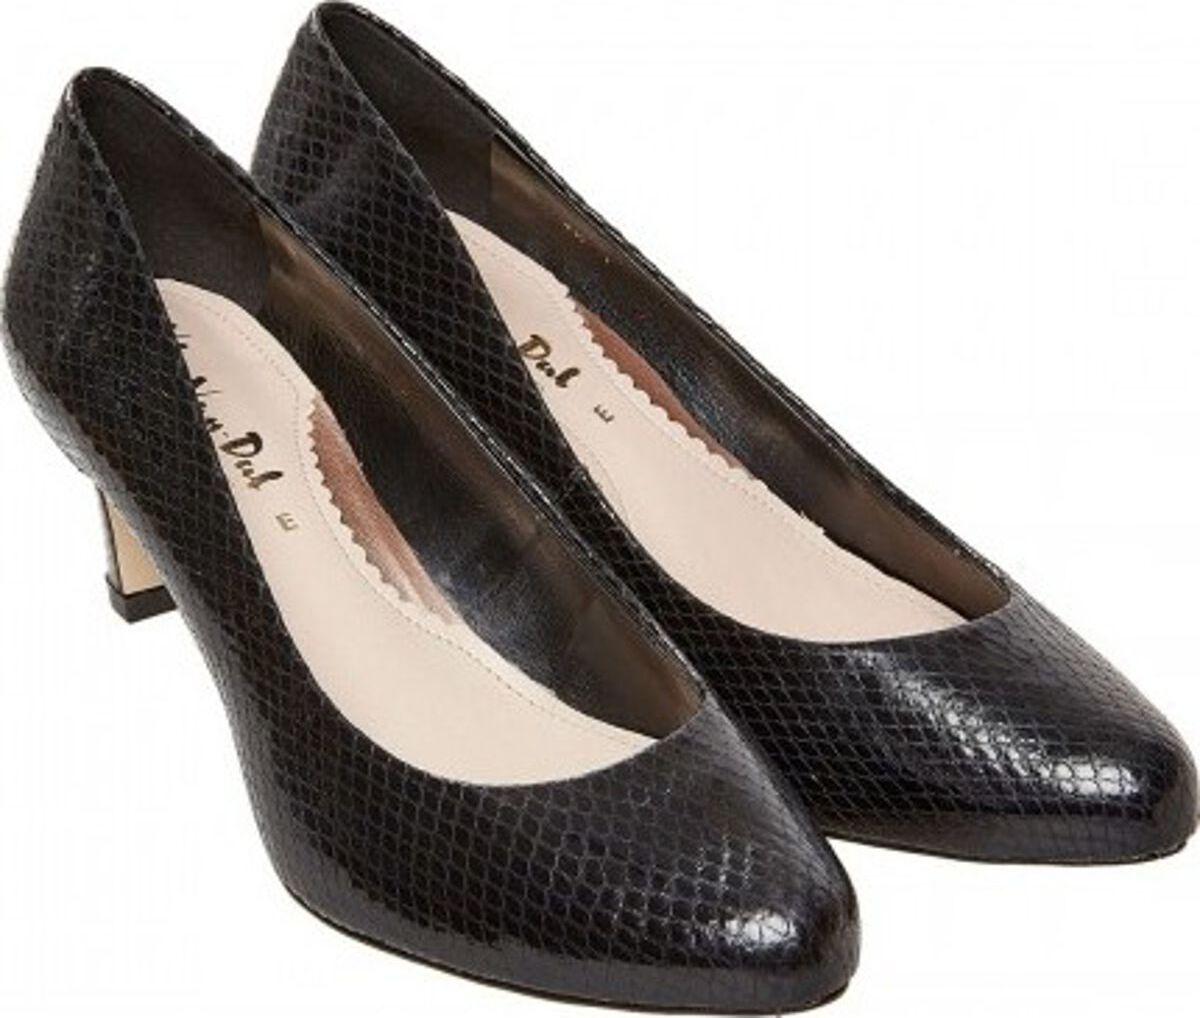 Ladies Van Dal Lowe Black Snake Print Court shoes Size 6.5 E Fitting